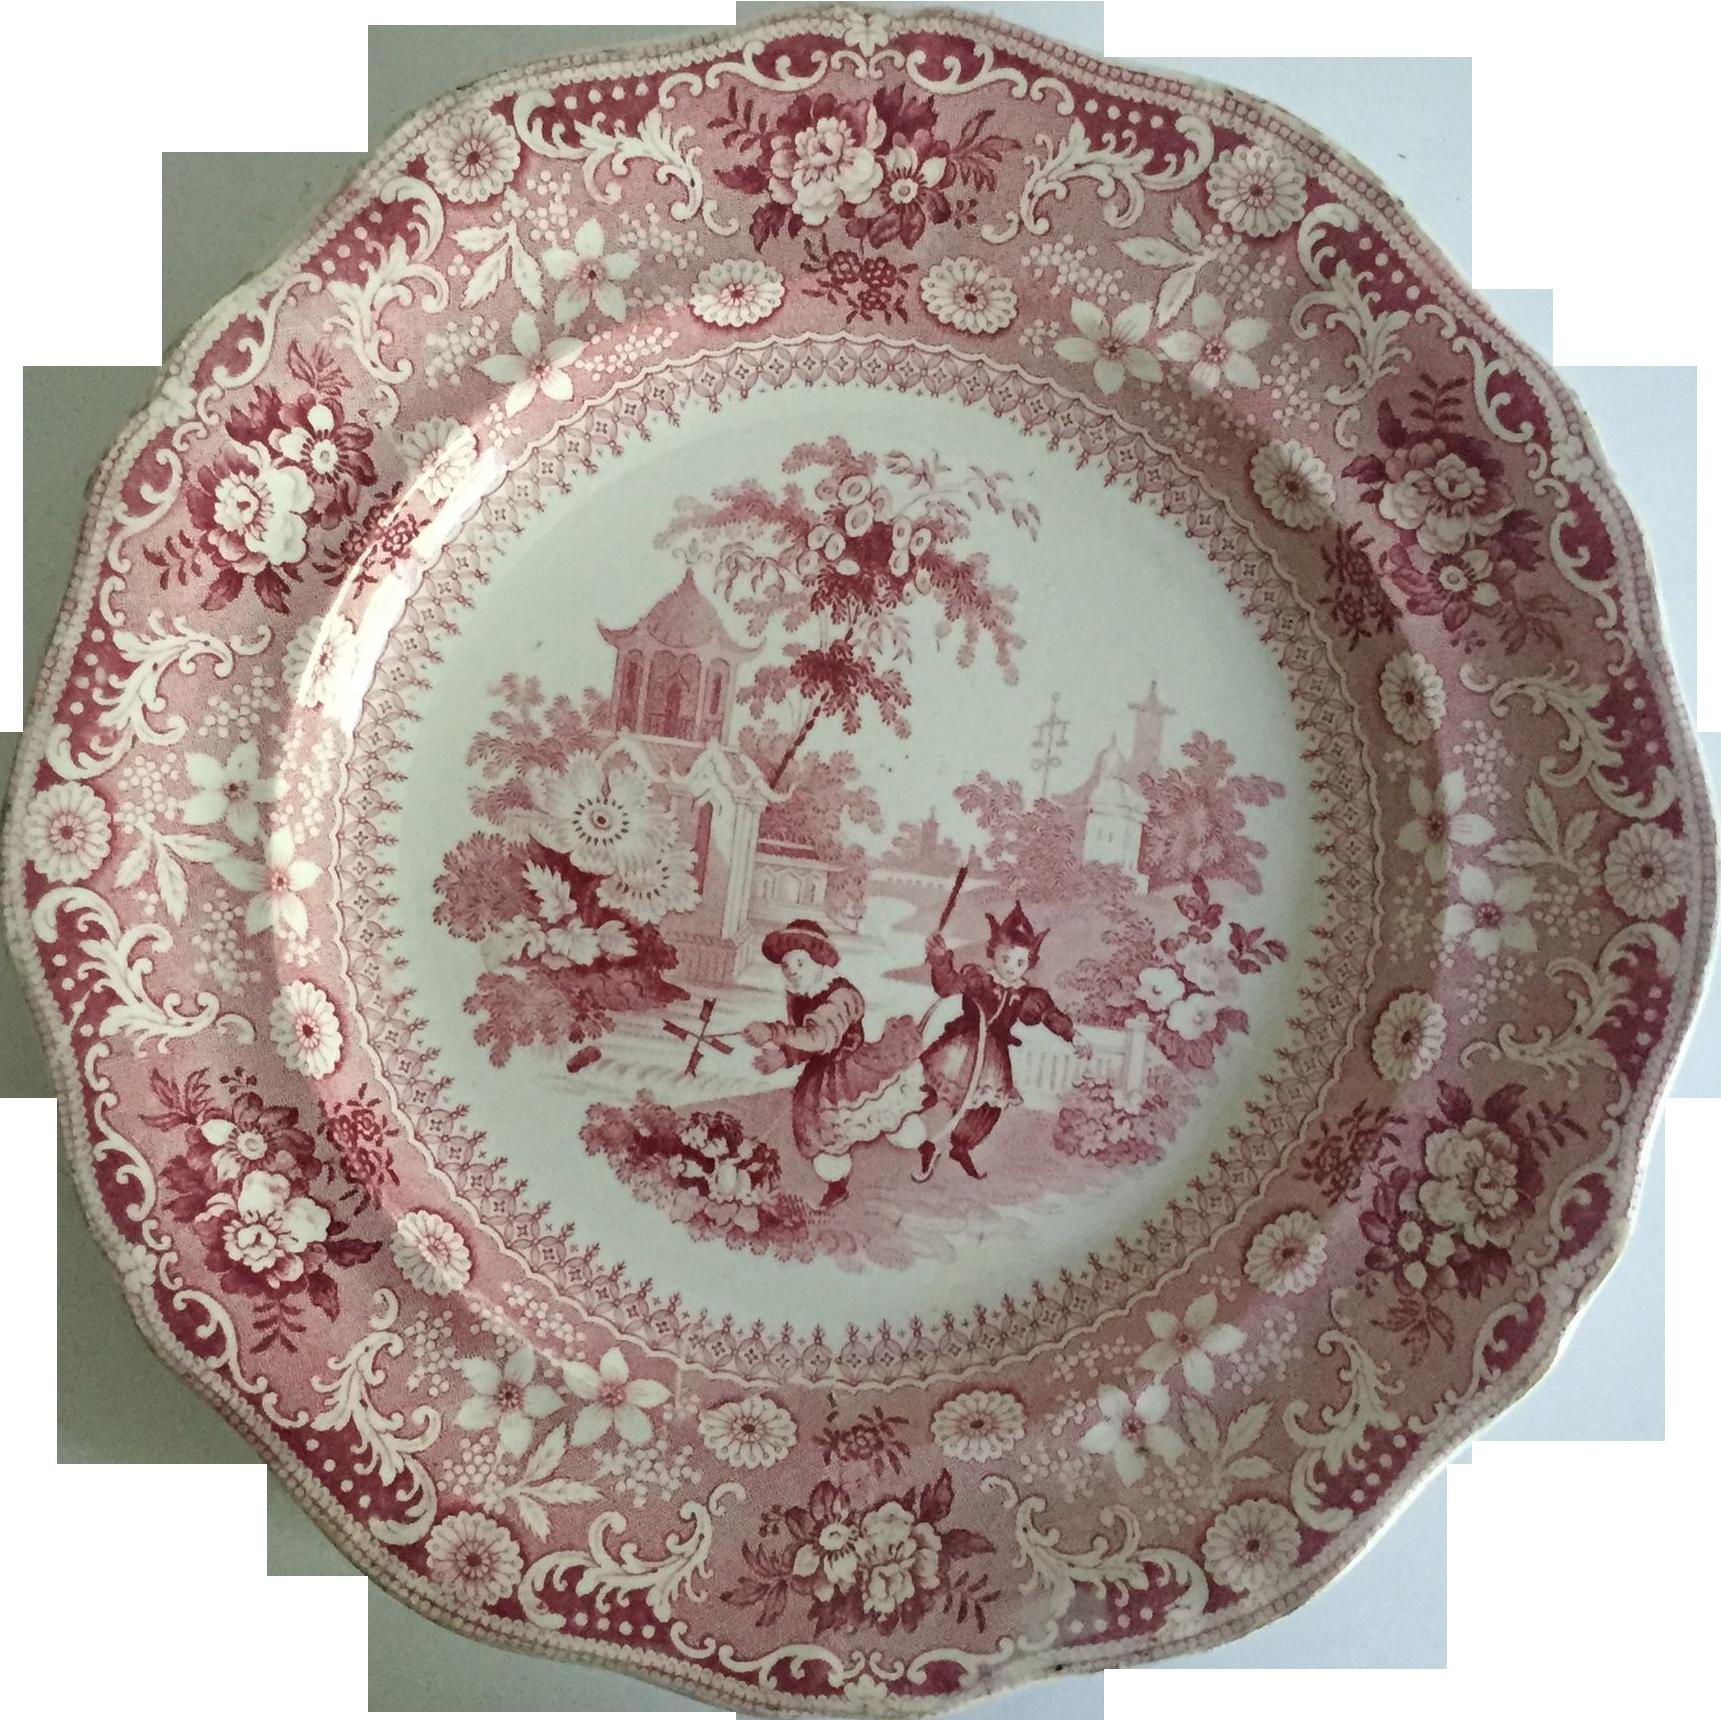 1860 Fashion Plate